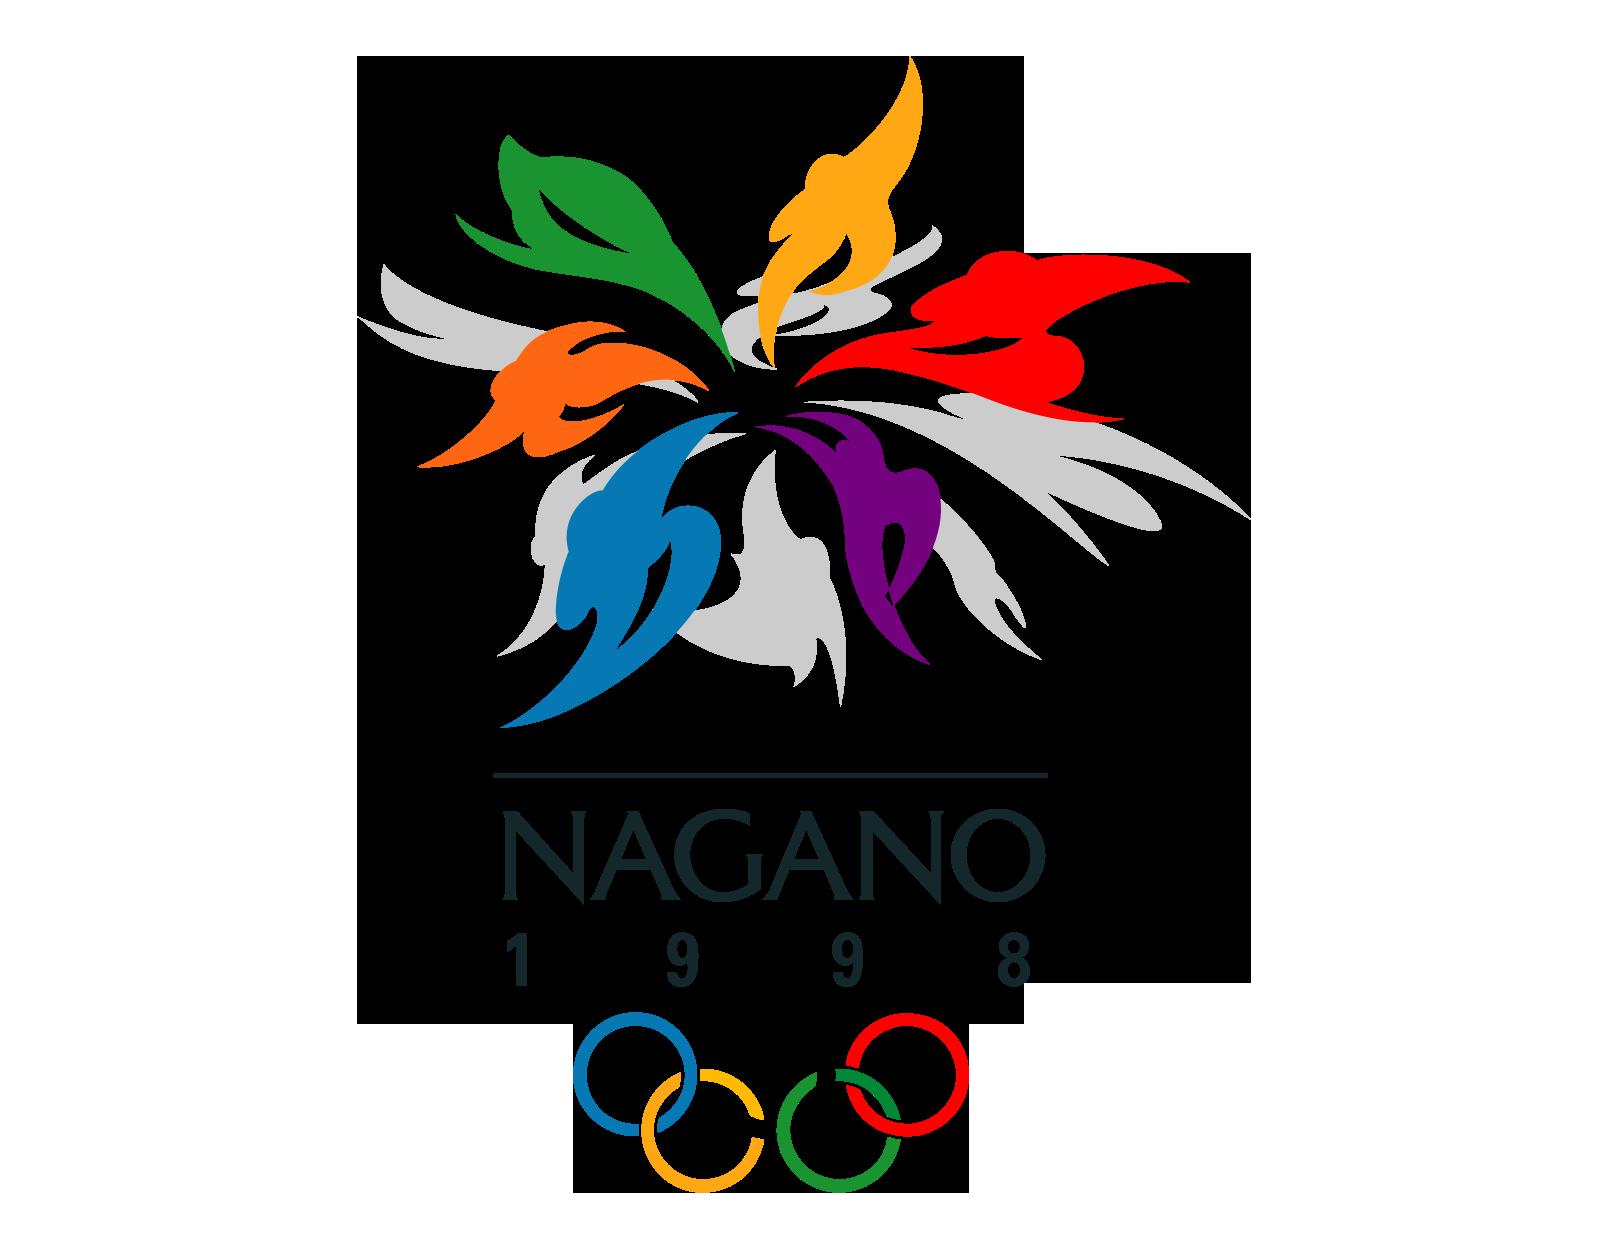 Nagano – Jeux olympiques d'hiver 1998